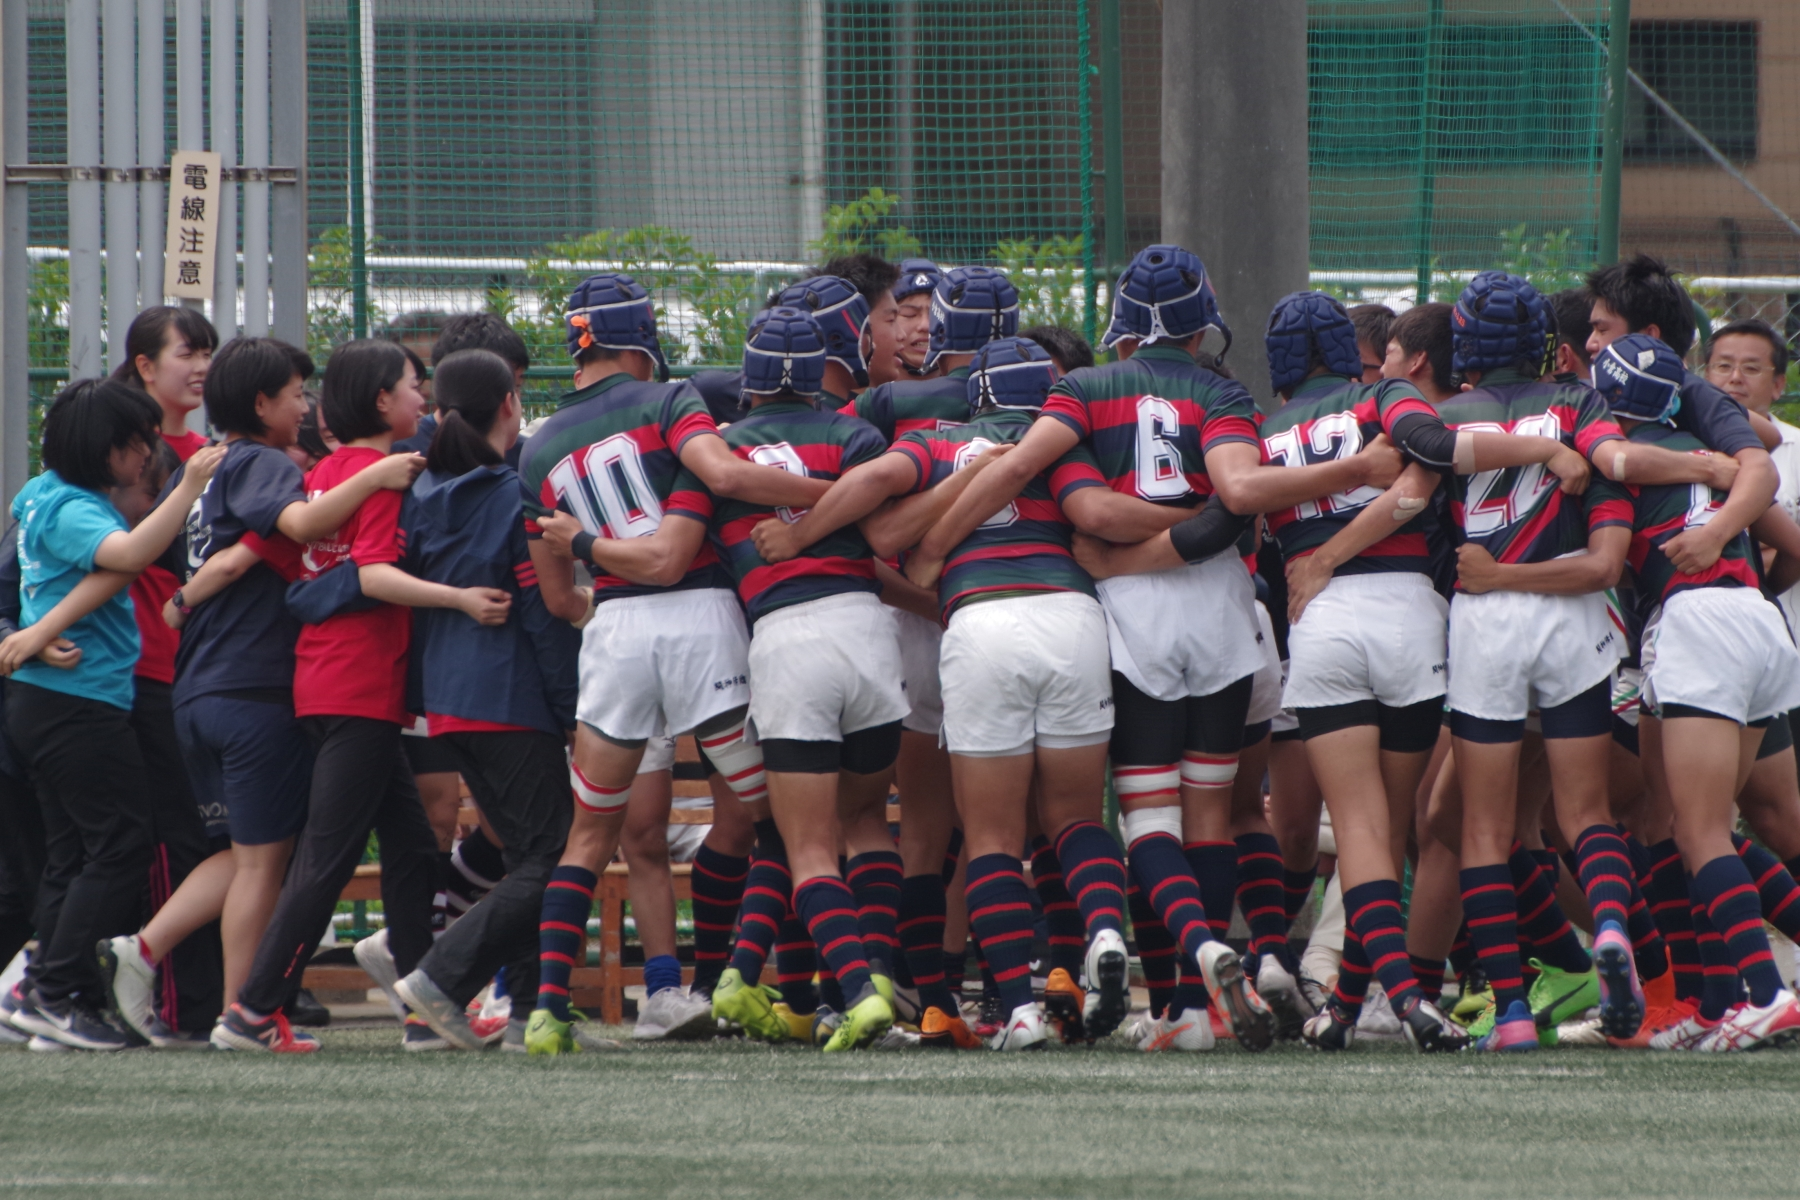 http://kokura-rugby.sakura.ne.jp/180610_102814_0055.jpg